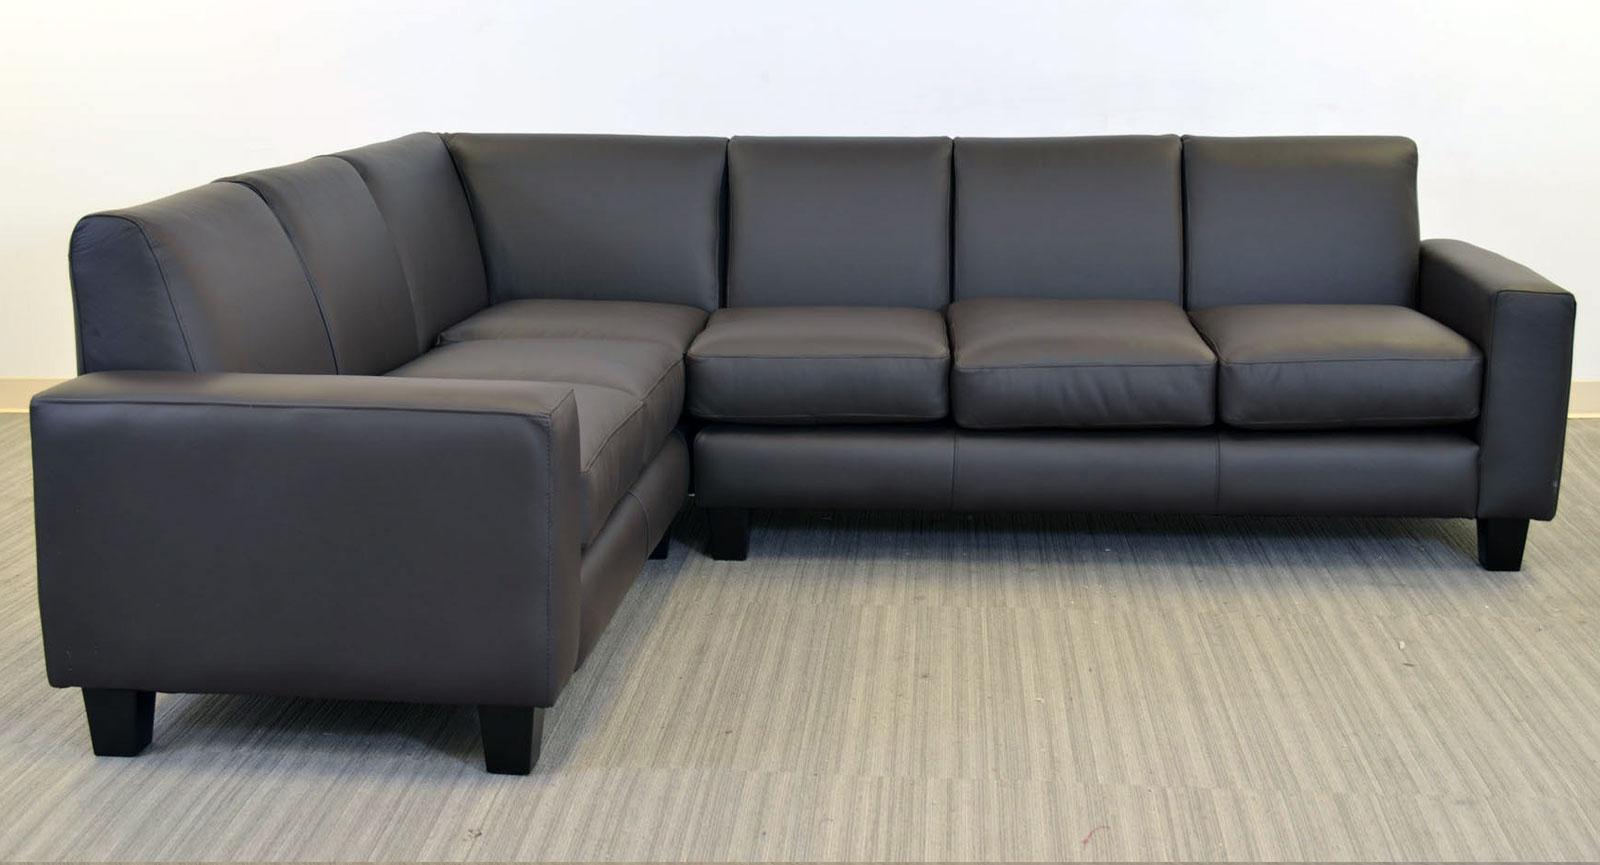 Elegante sofa the leather sofa company for Sofa elegante